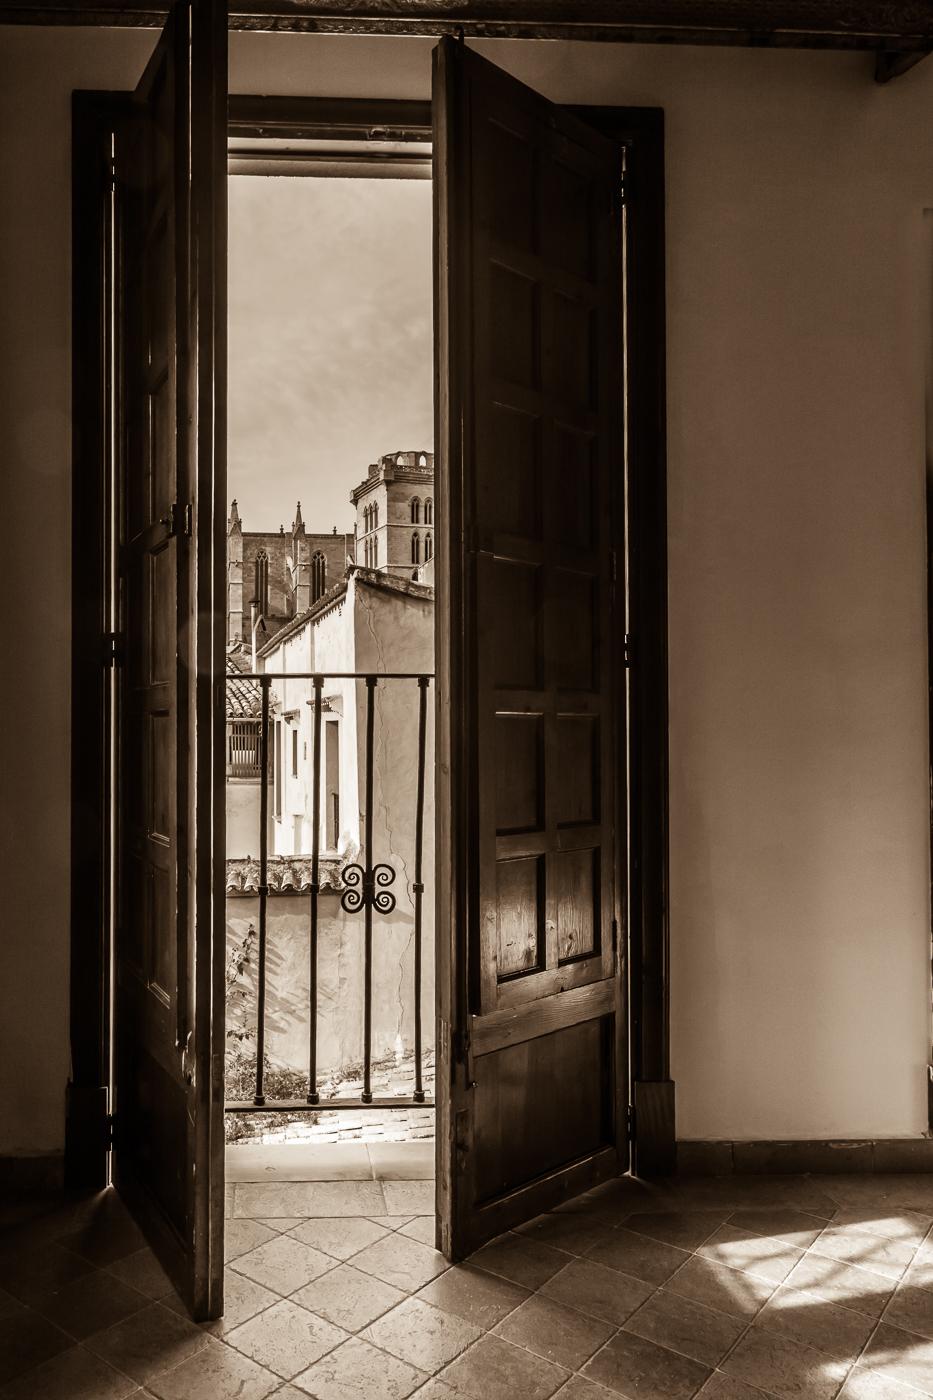 Through the window, Carmel Morris